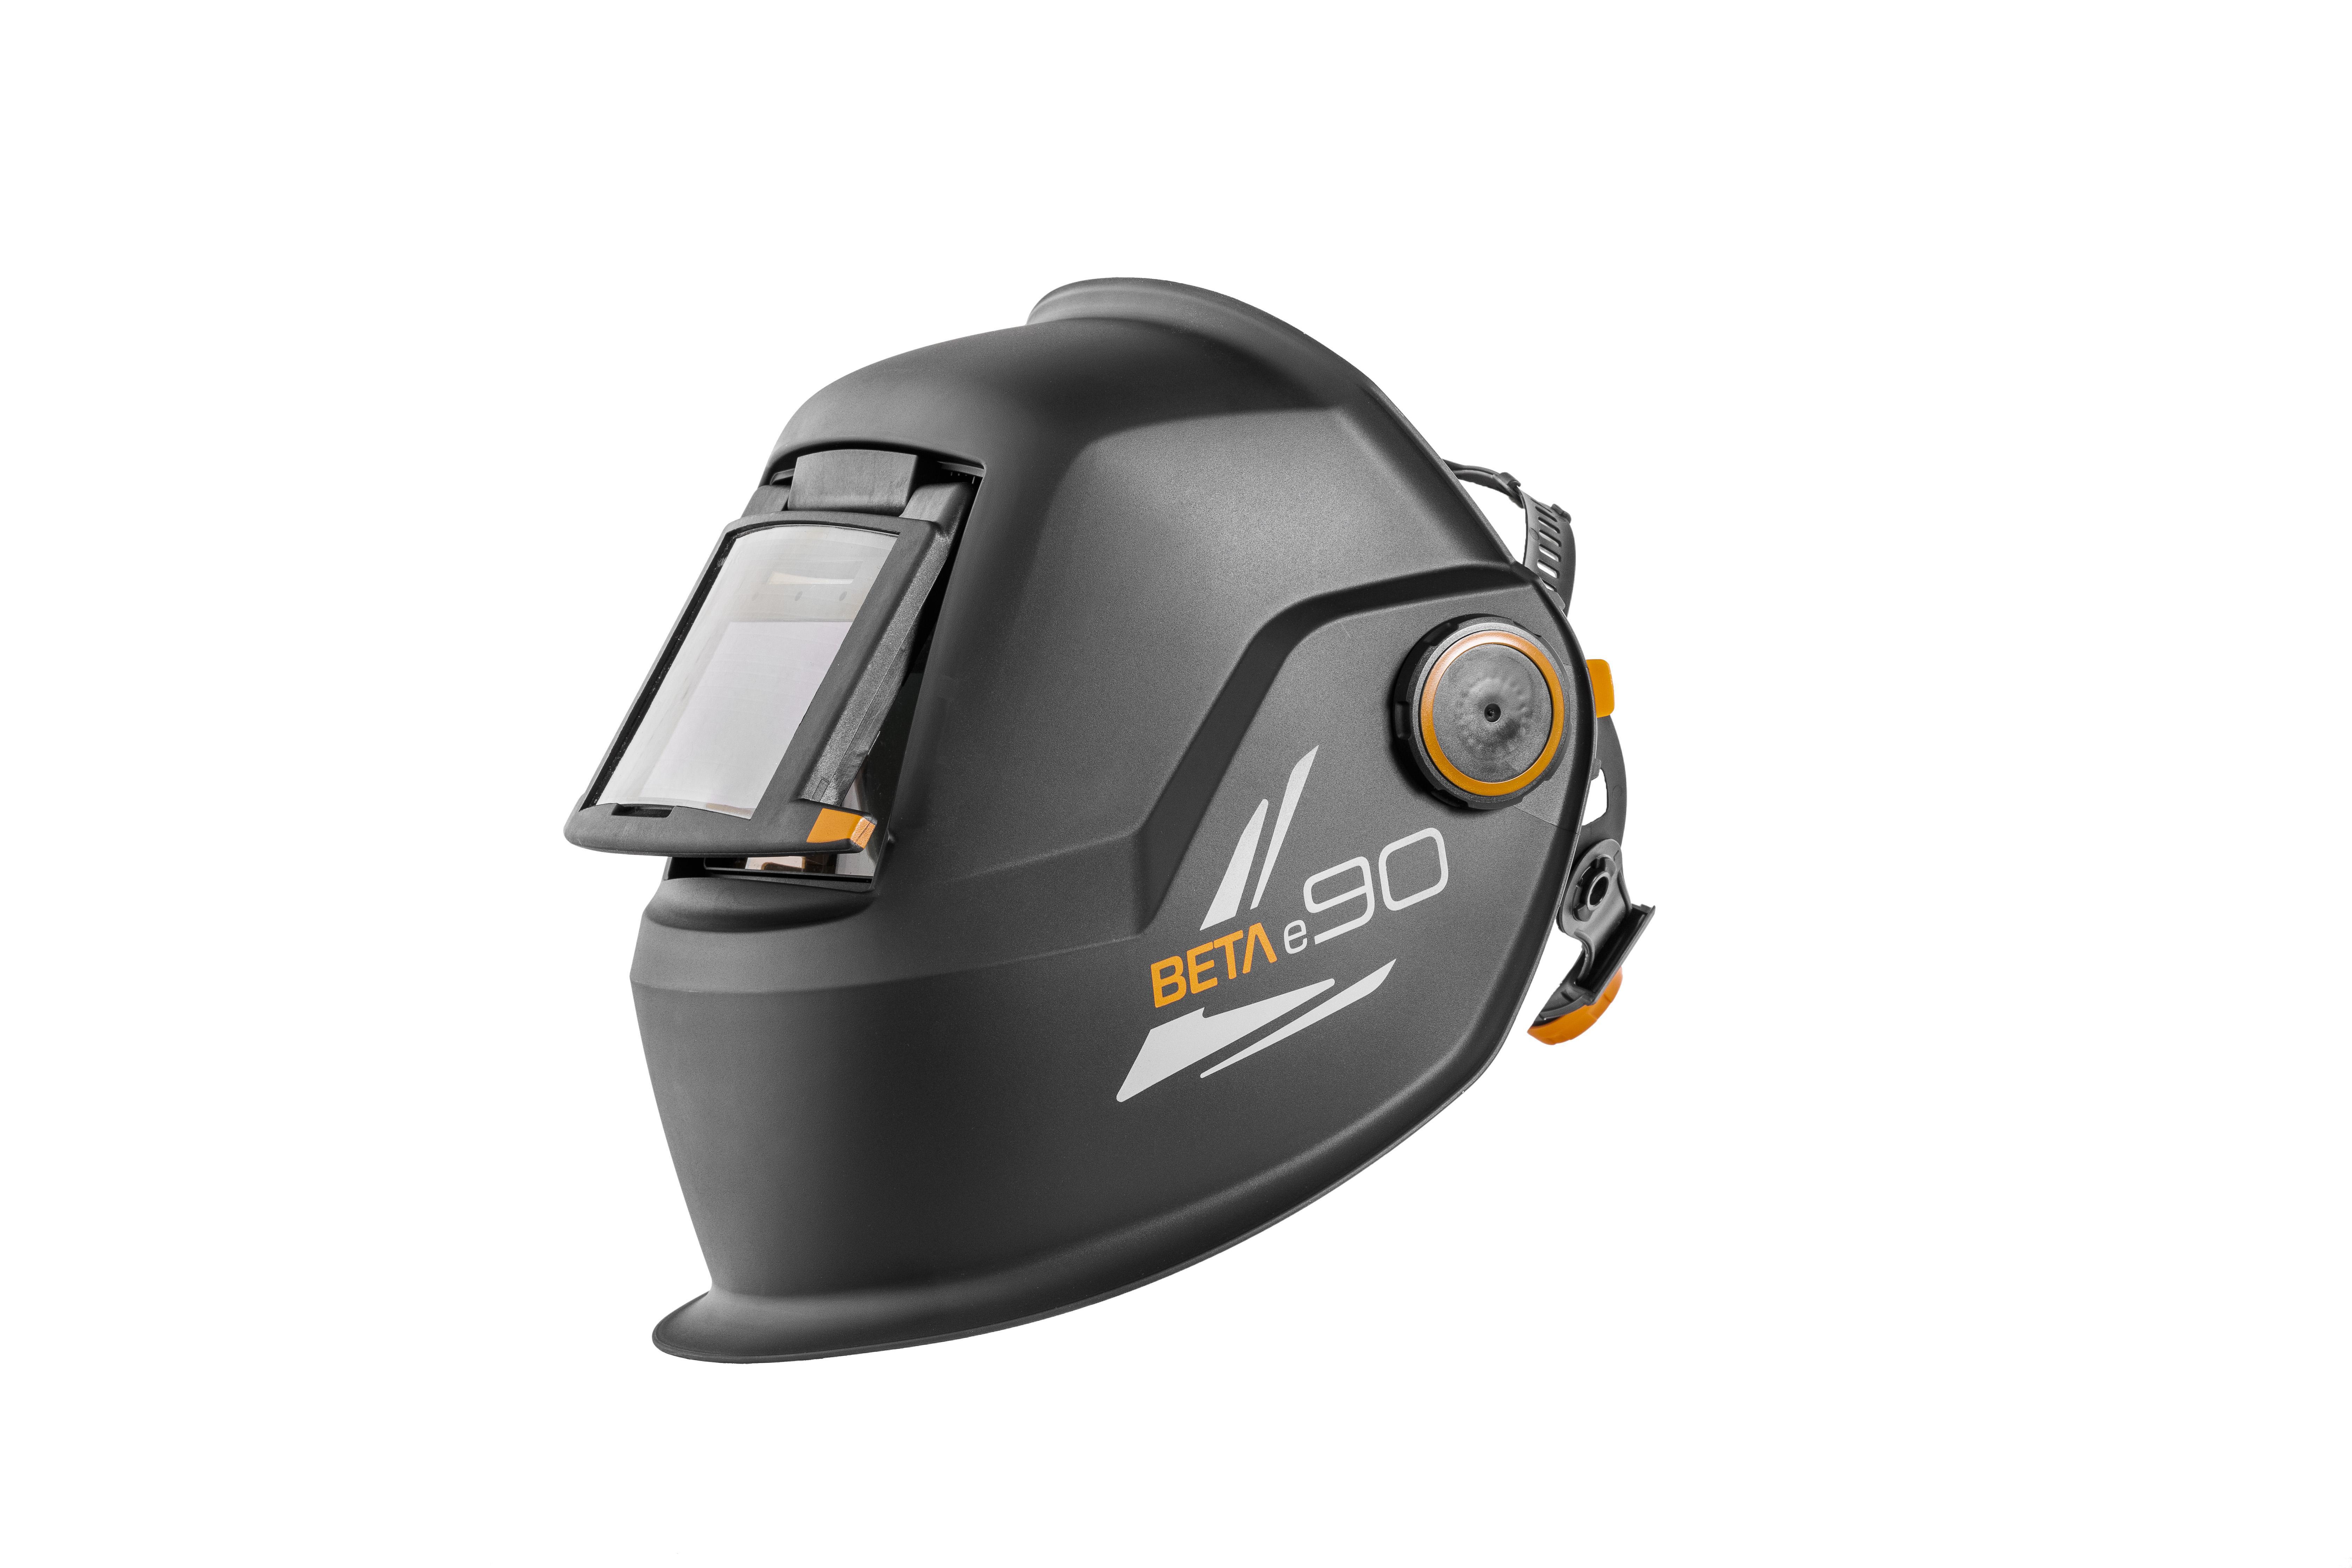 Сварочная маска Kemppi Beta e90a (9873023) сварочная маска kemppi beta e90p 9873022